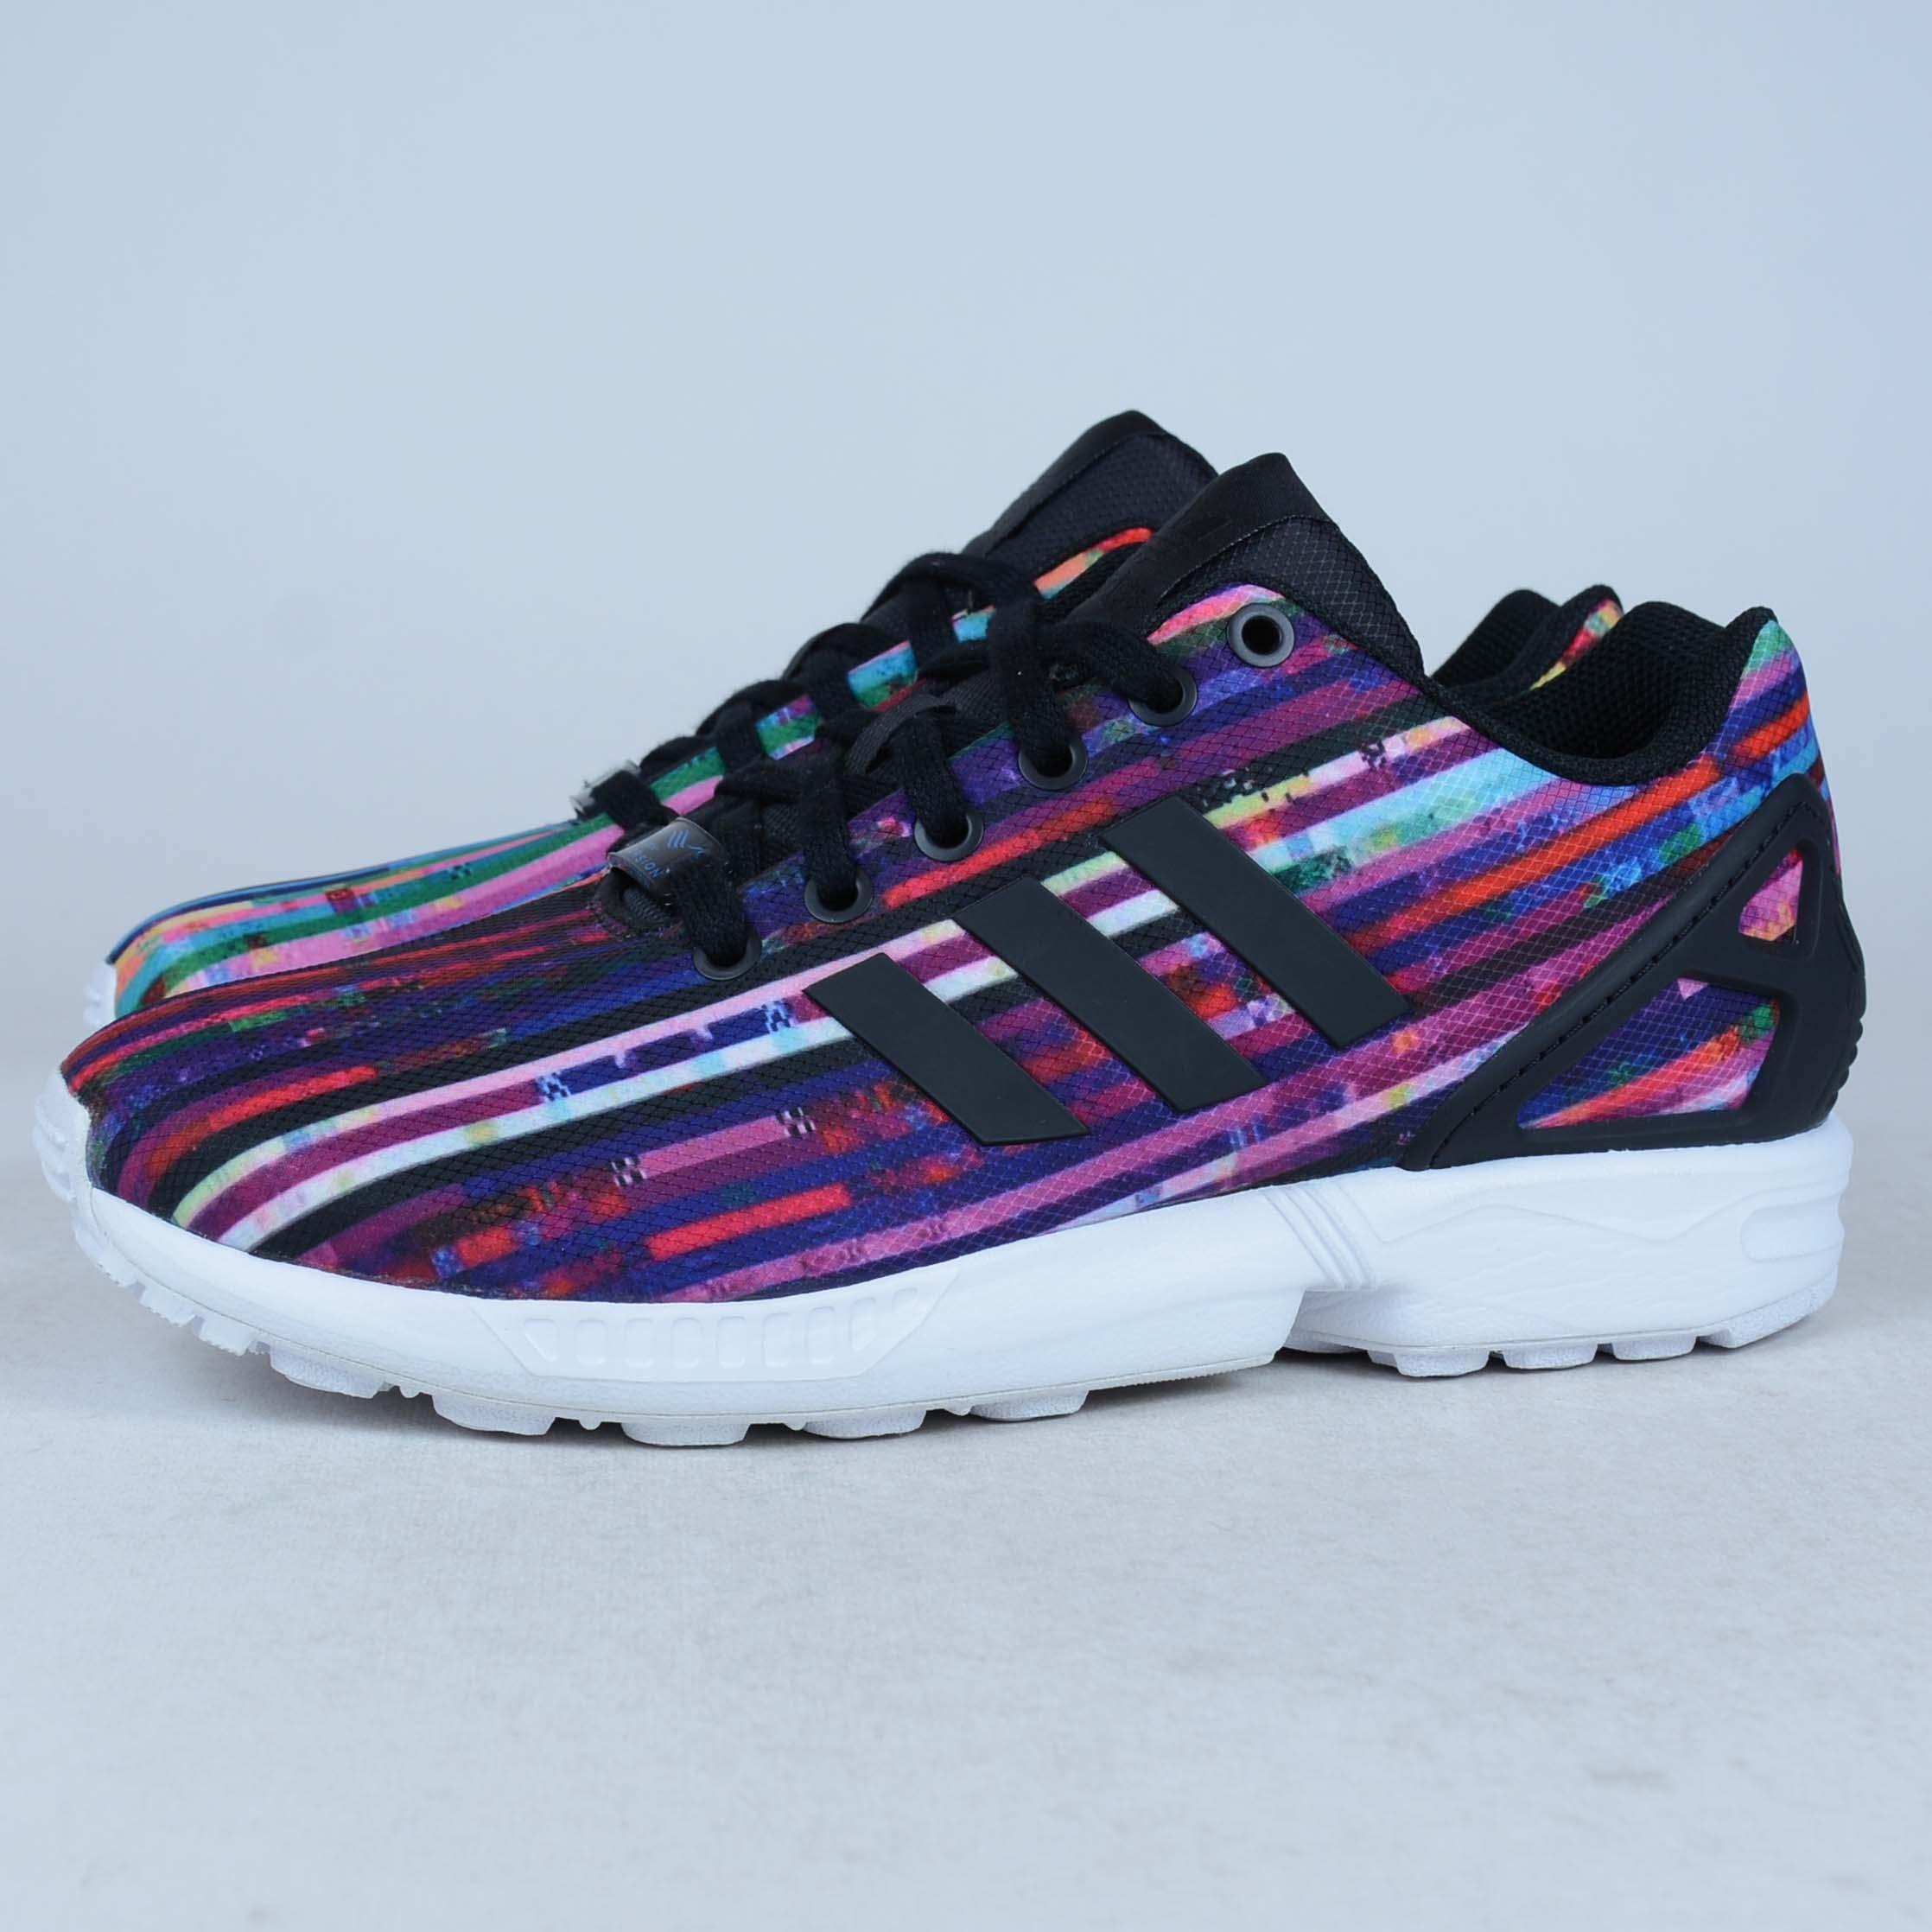 8f64b407d9fa3 ... real adidas zx flux rainbow multi color size 7.5 running s76504 defect  display ebay 92edb 51461 ...